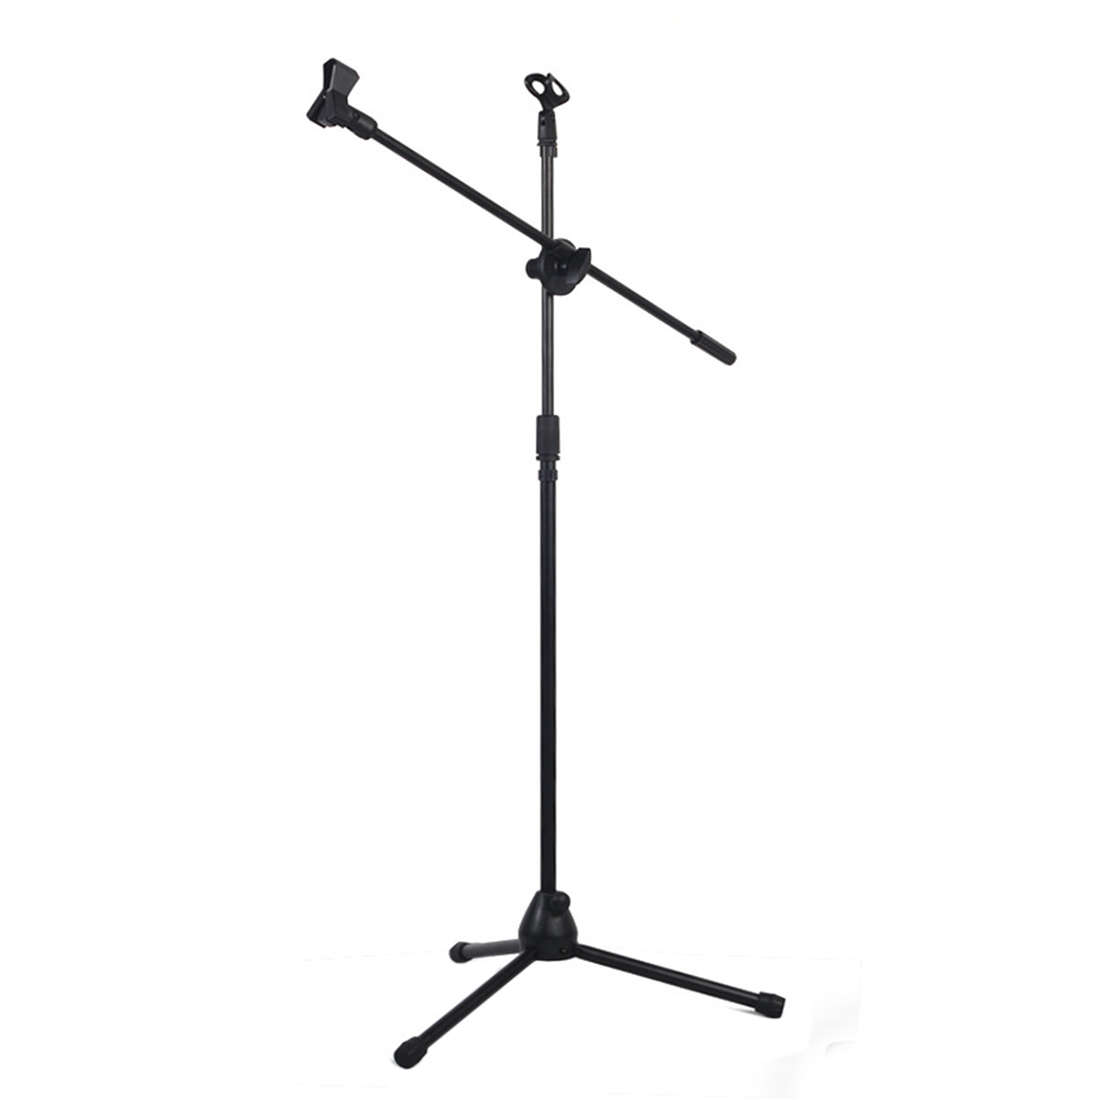 Unterhaltungselektronik Erweiterbar Aufnahme Mikrofon Halter Metall Einstellbare Broadcast Studio Mikrofon Mic Suspension Boom Scissor Arm Steht Clip